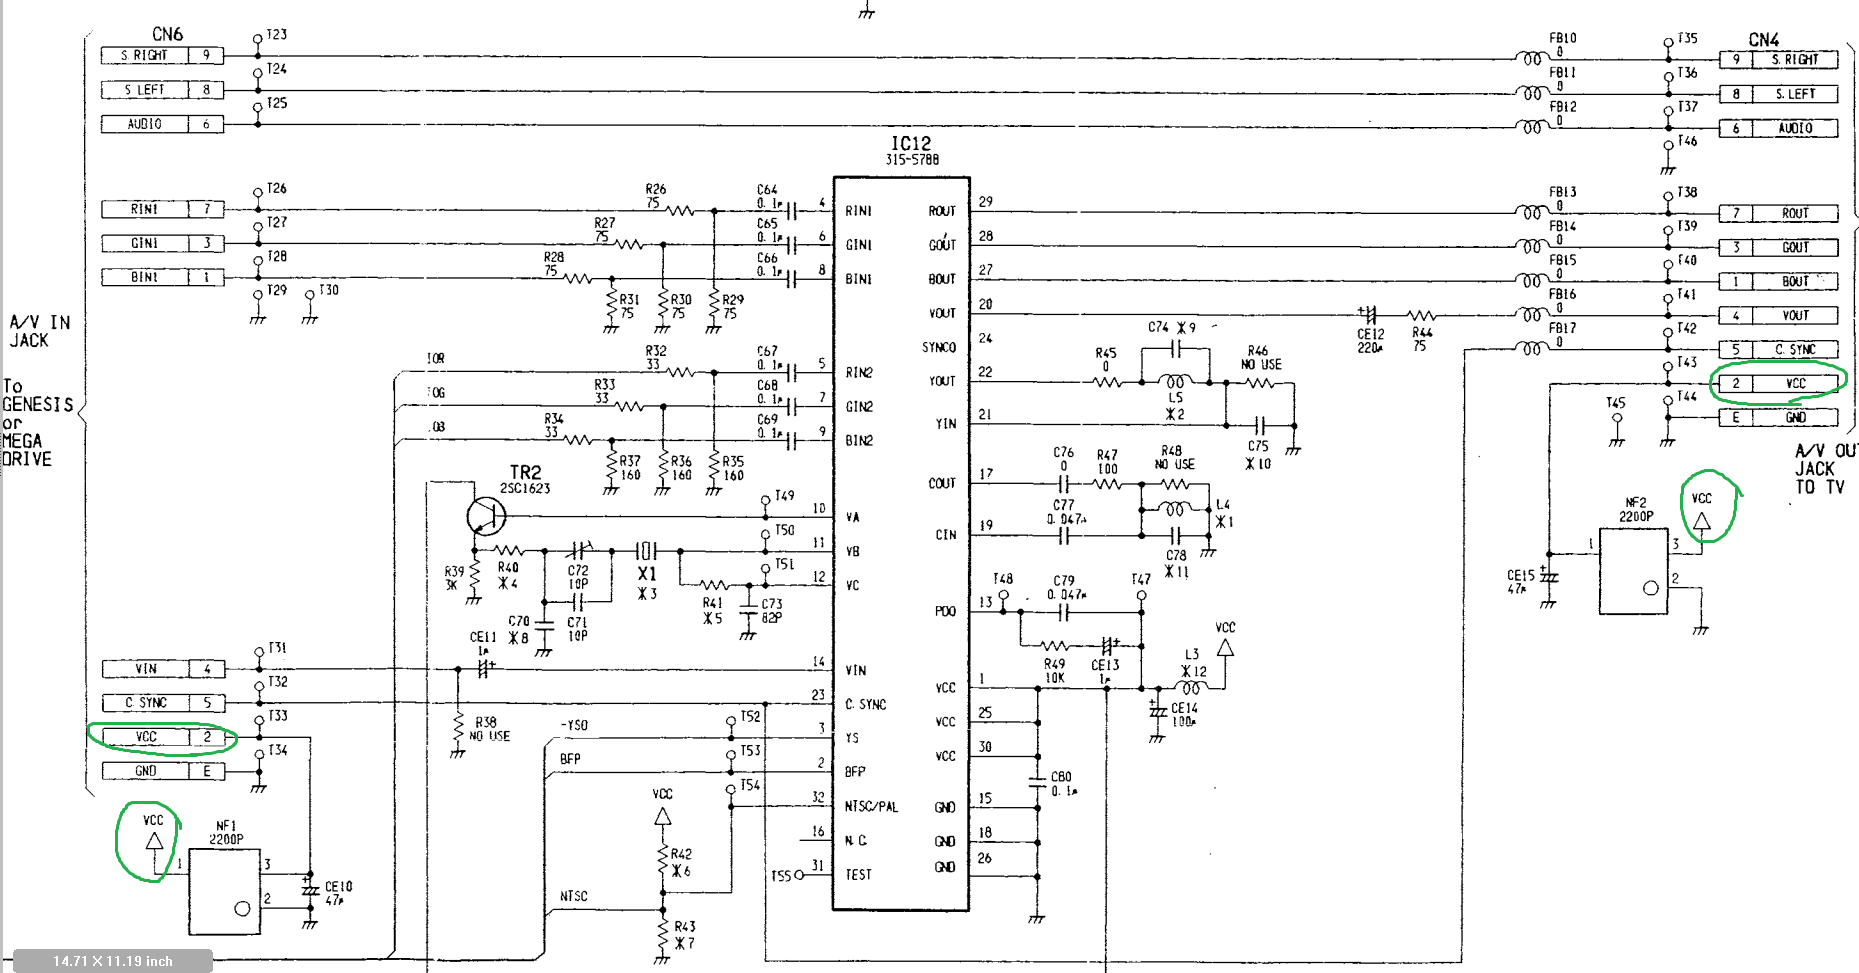 Sega Genesis Wiring Diagram Colecovision Auto Sony